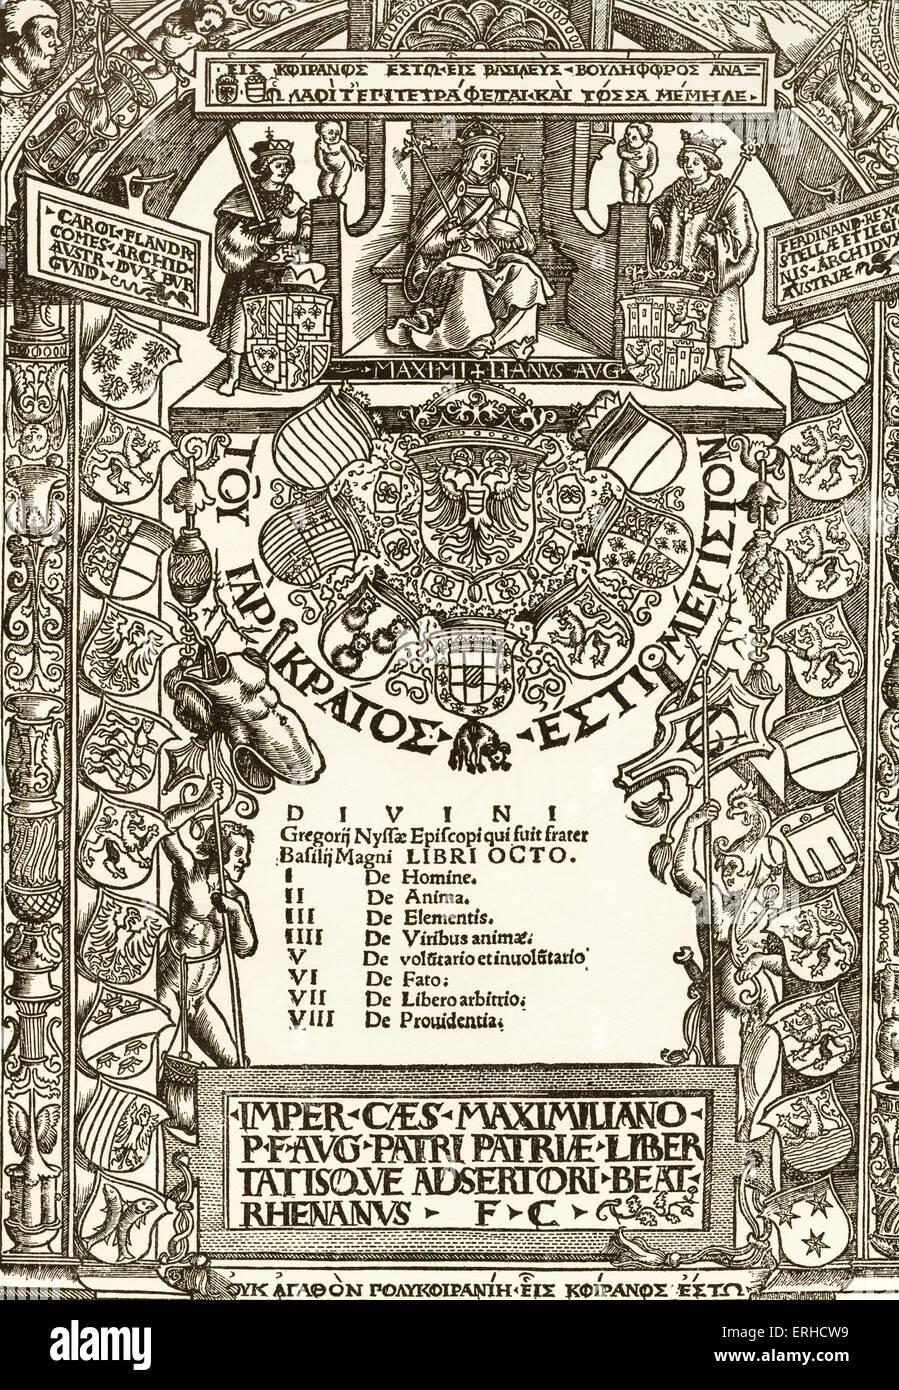 Kaiser Maximilian Titelseite, Holzschnitt von Urs Graf, Mai 1512. Hommage an Kaiser Maximilian, thront oben in der Stockbild